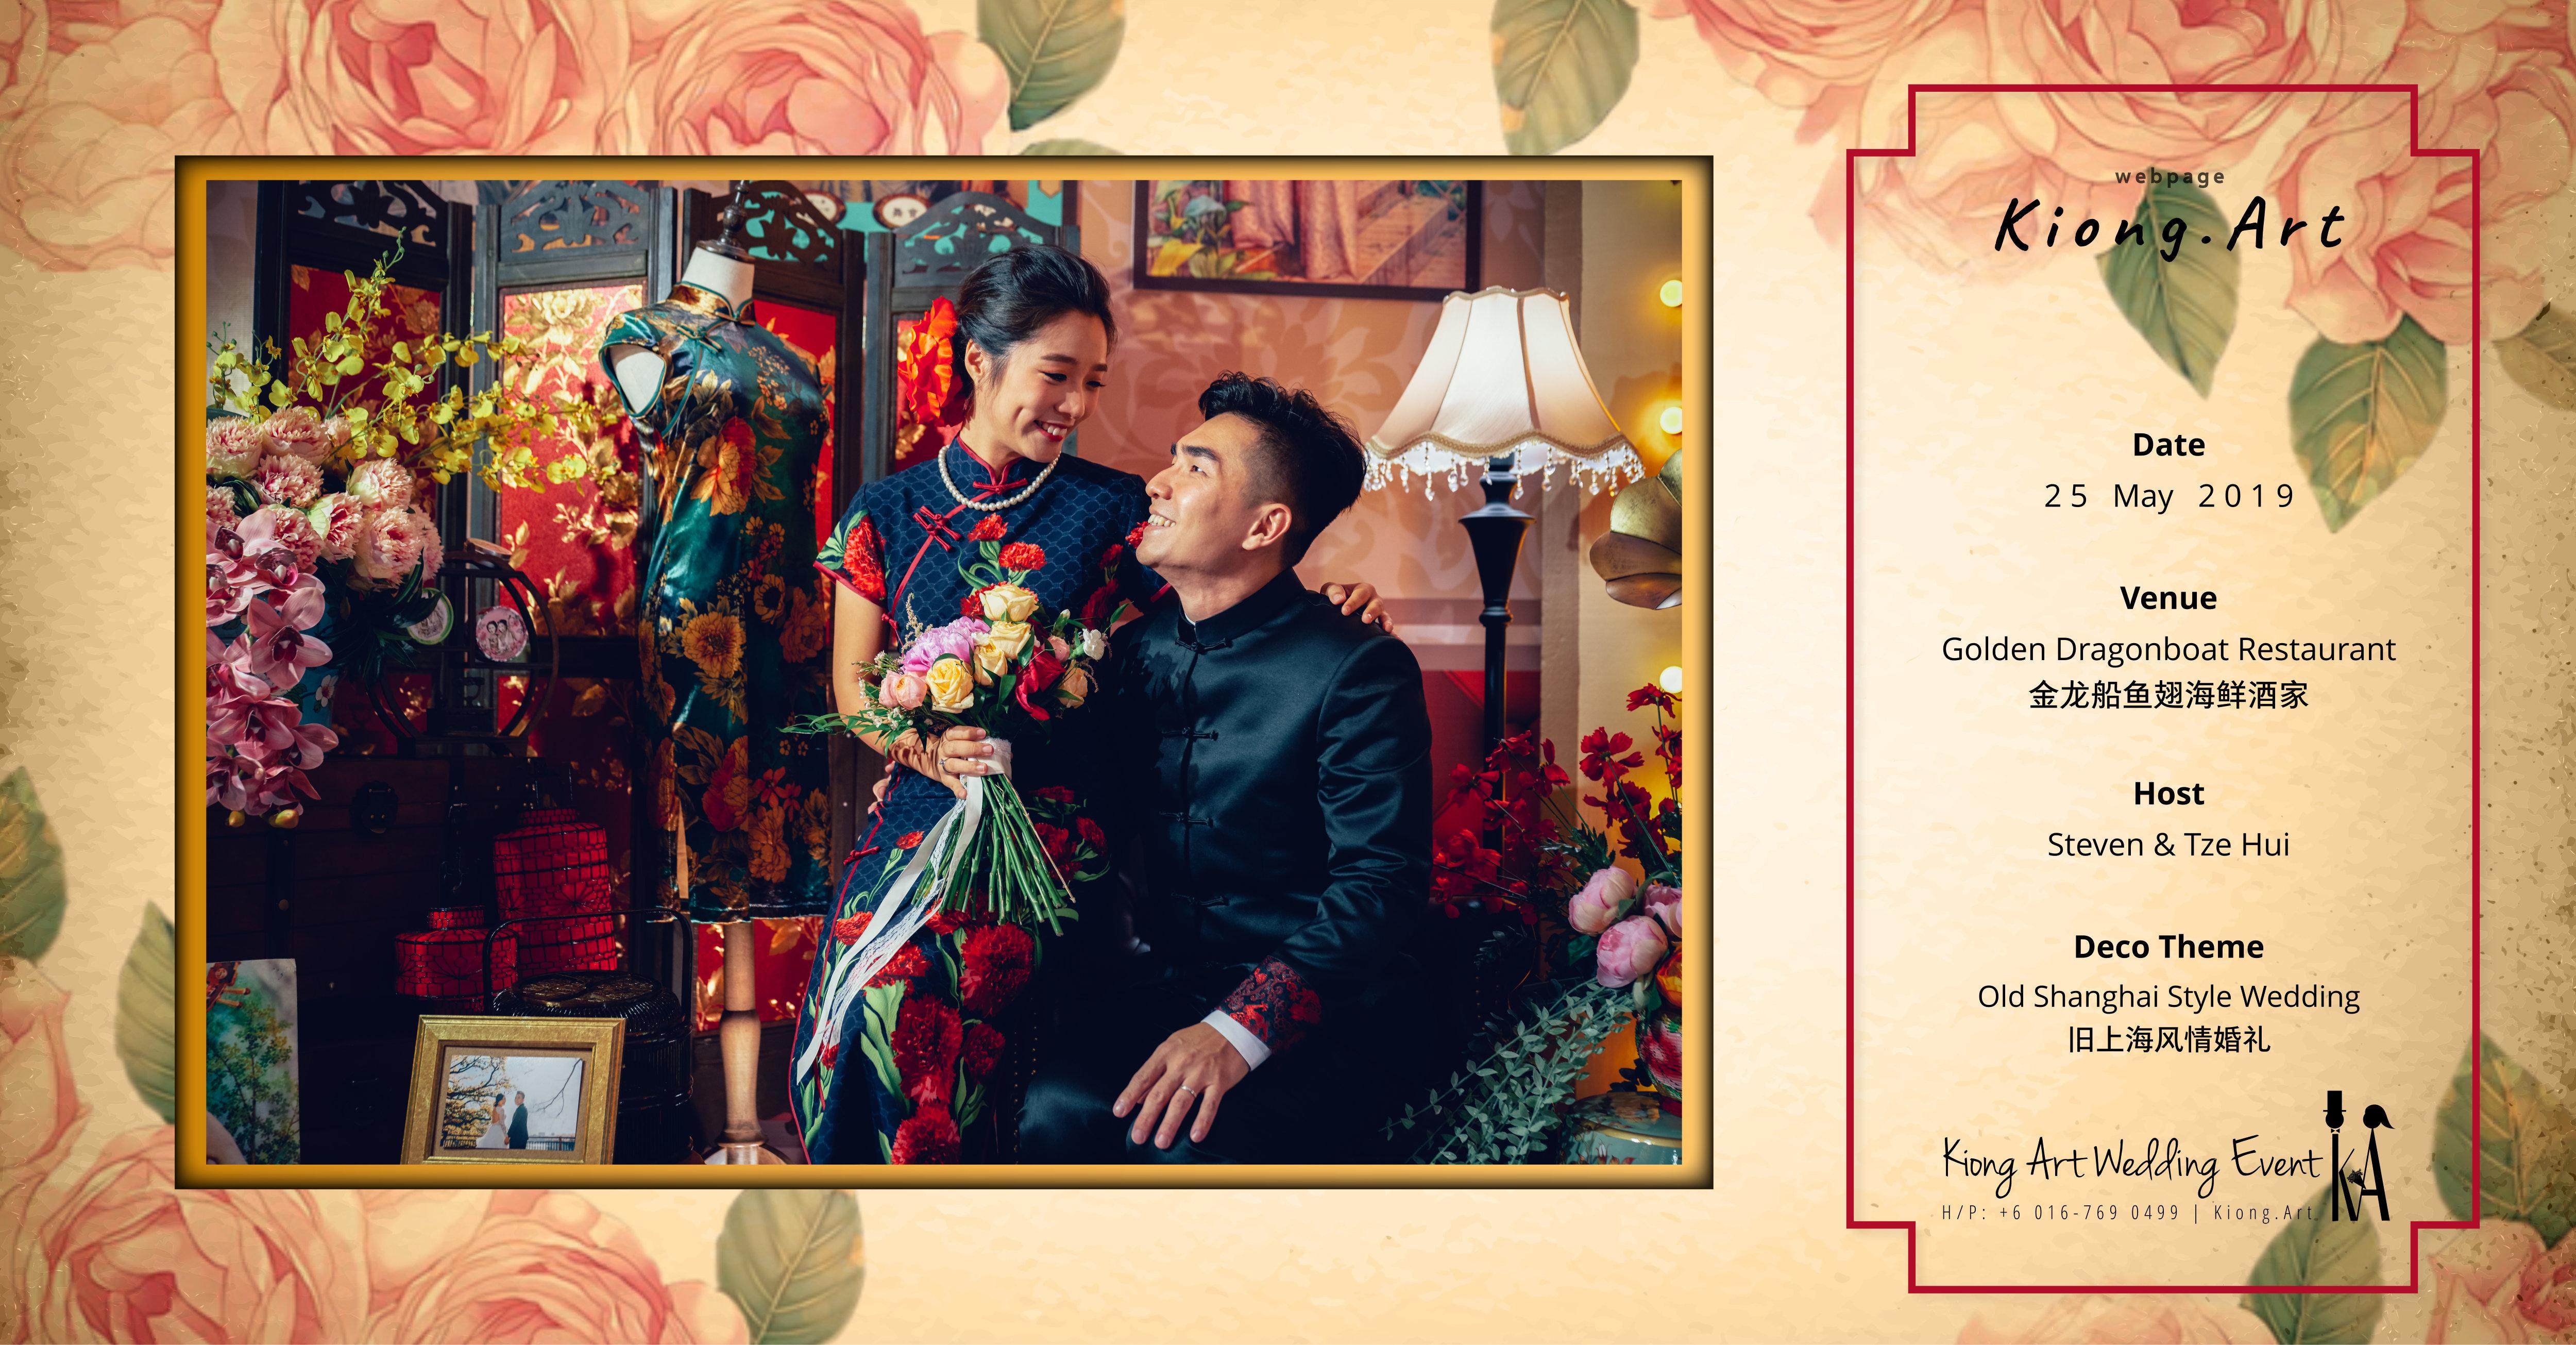 Kuala Lumpur Wedding Deco Decoration Kiong Art Wedding Deco Old Shanghai Style Wedding 旧上海风情婚礼 Steven and Tze Hui at Golden Dragonboat Restaurant 金龙船鱼翅海鲜酒家 Malaysia A16-B00-006